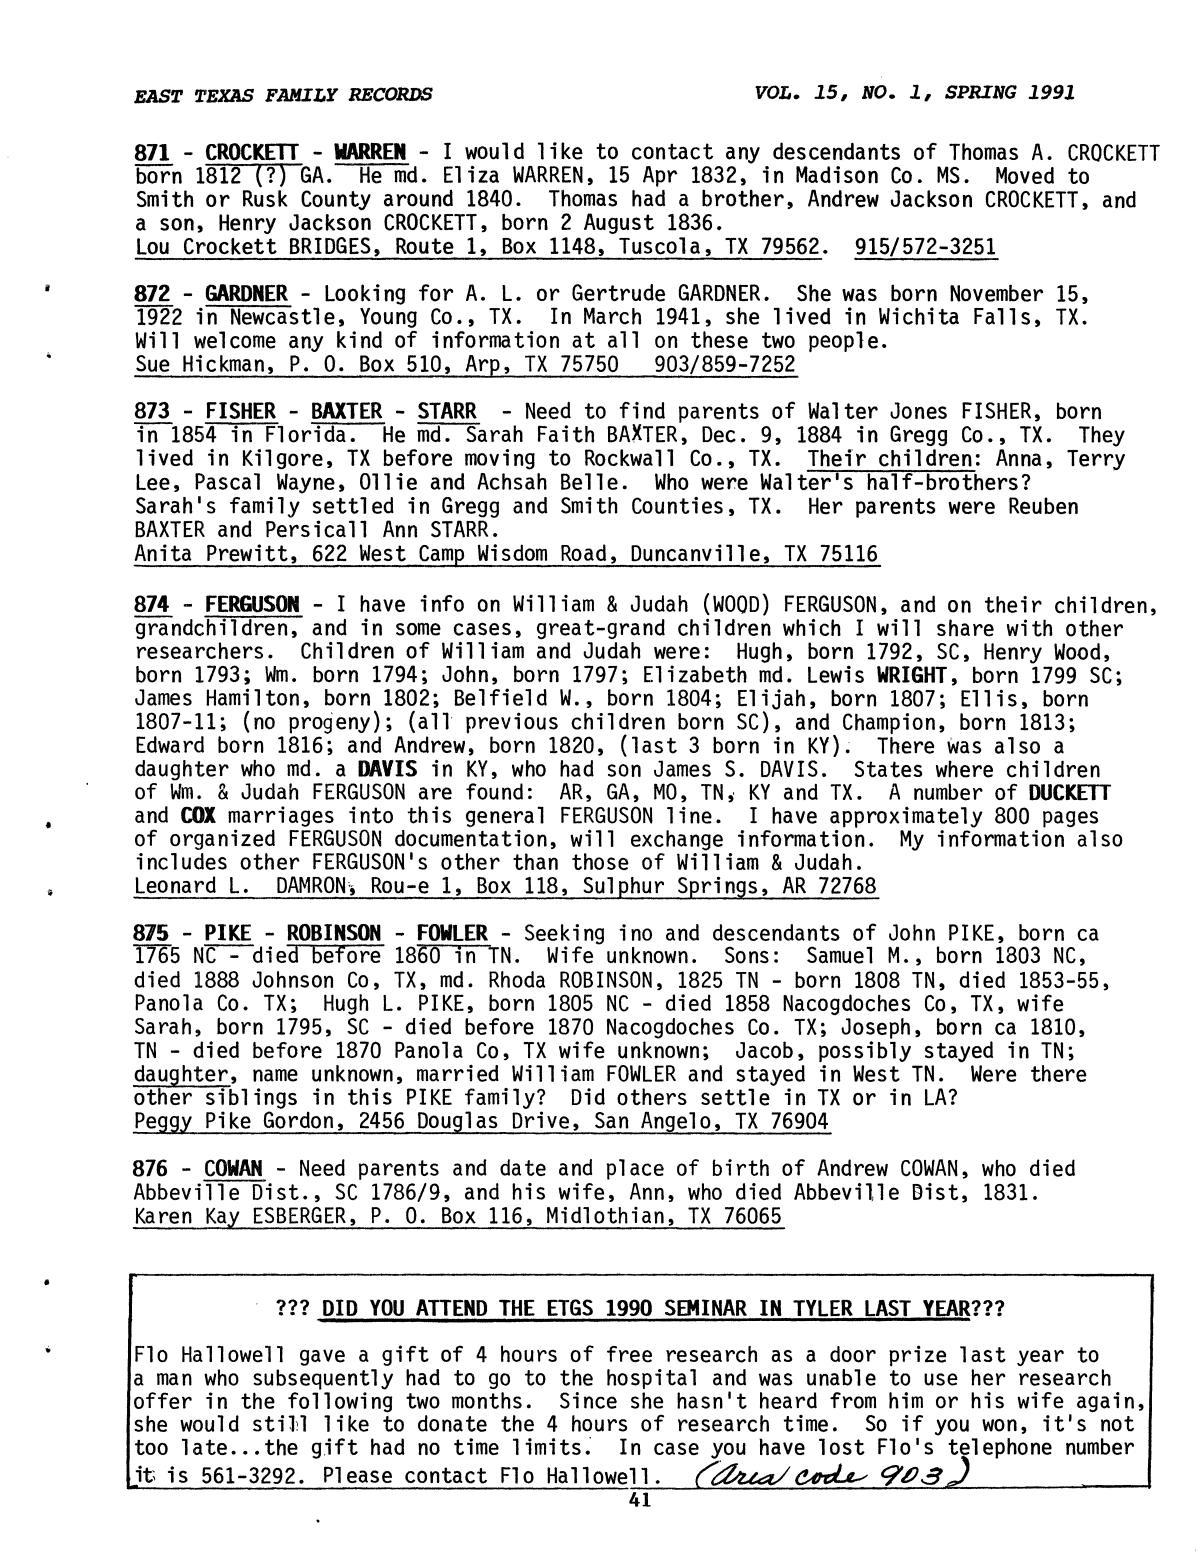 Criminal History Conviction Search